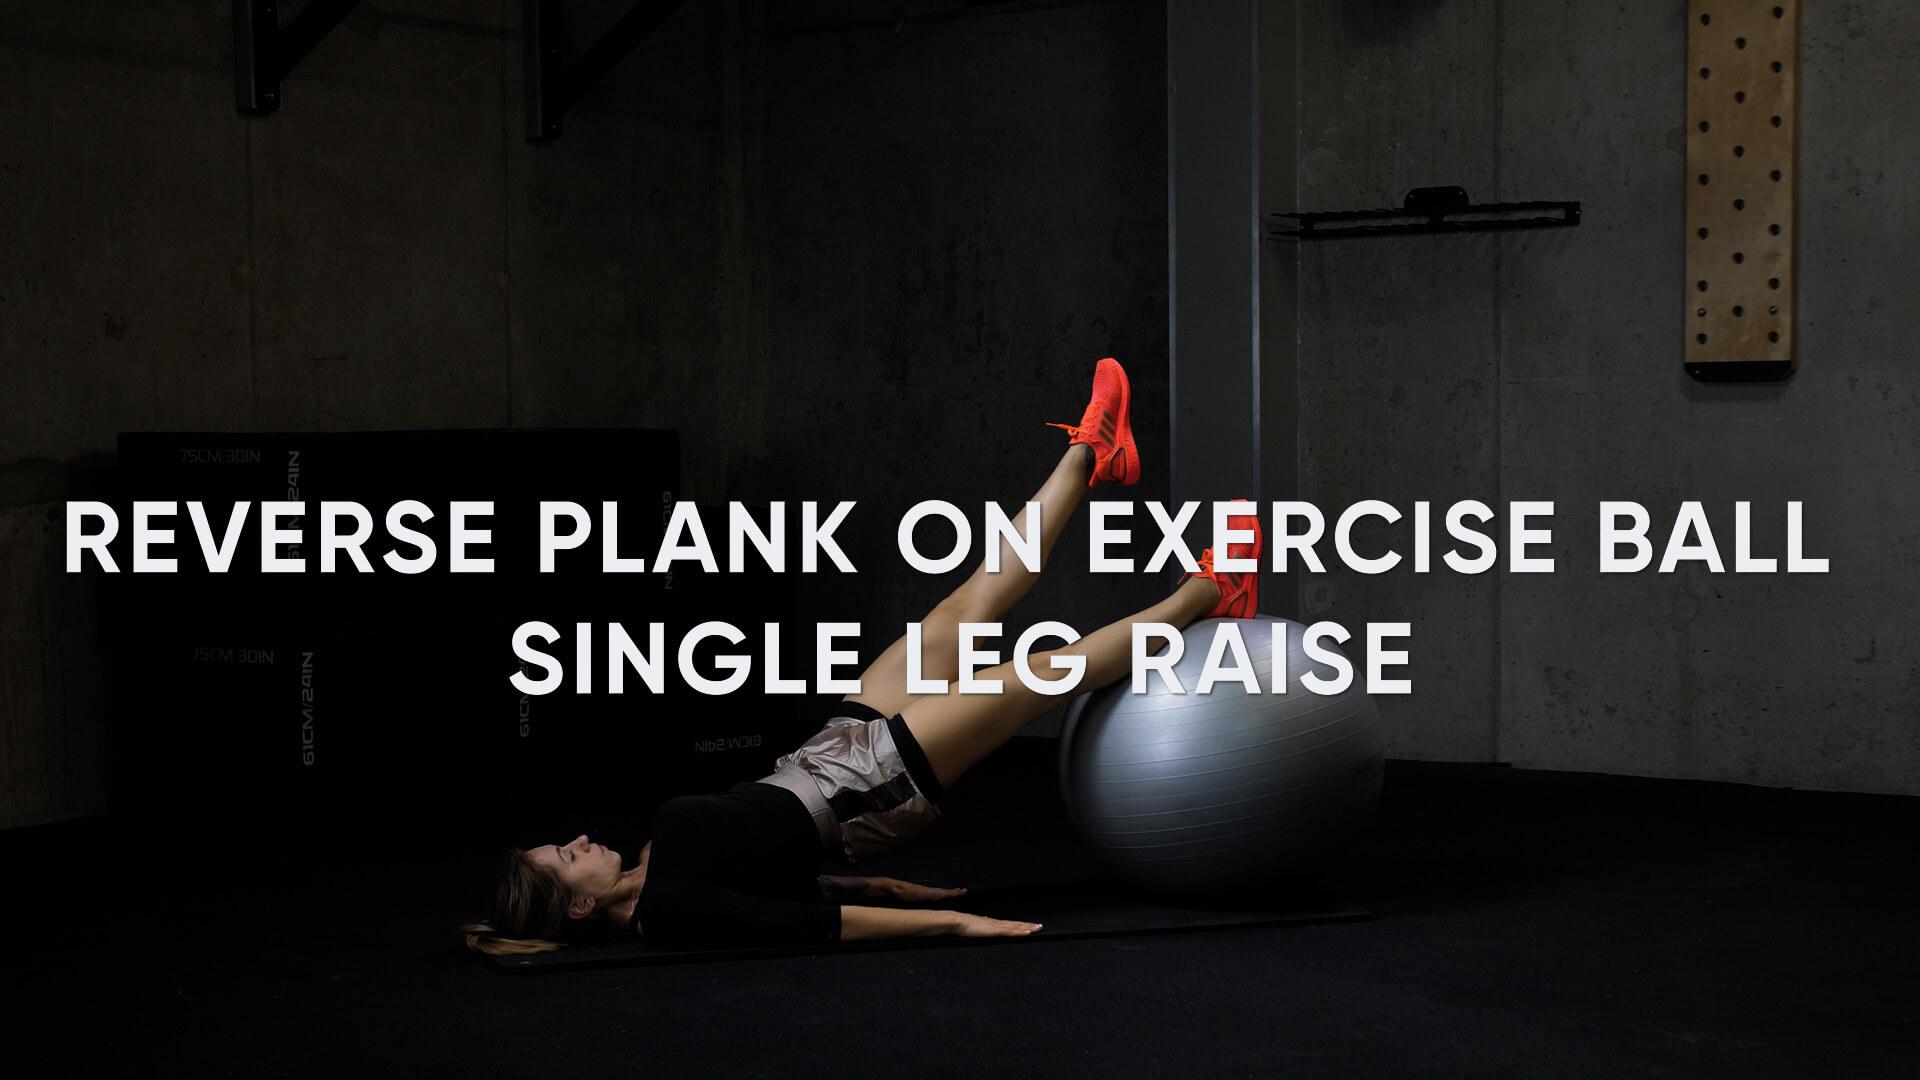 Reverse Plank on Exercise Ball Single Leg Raise